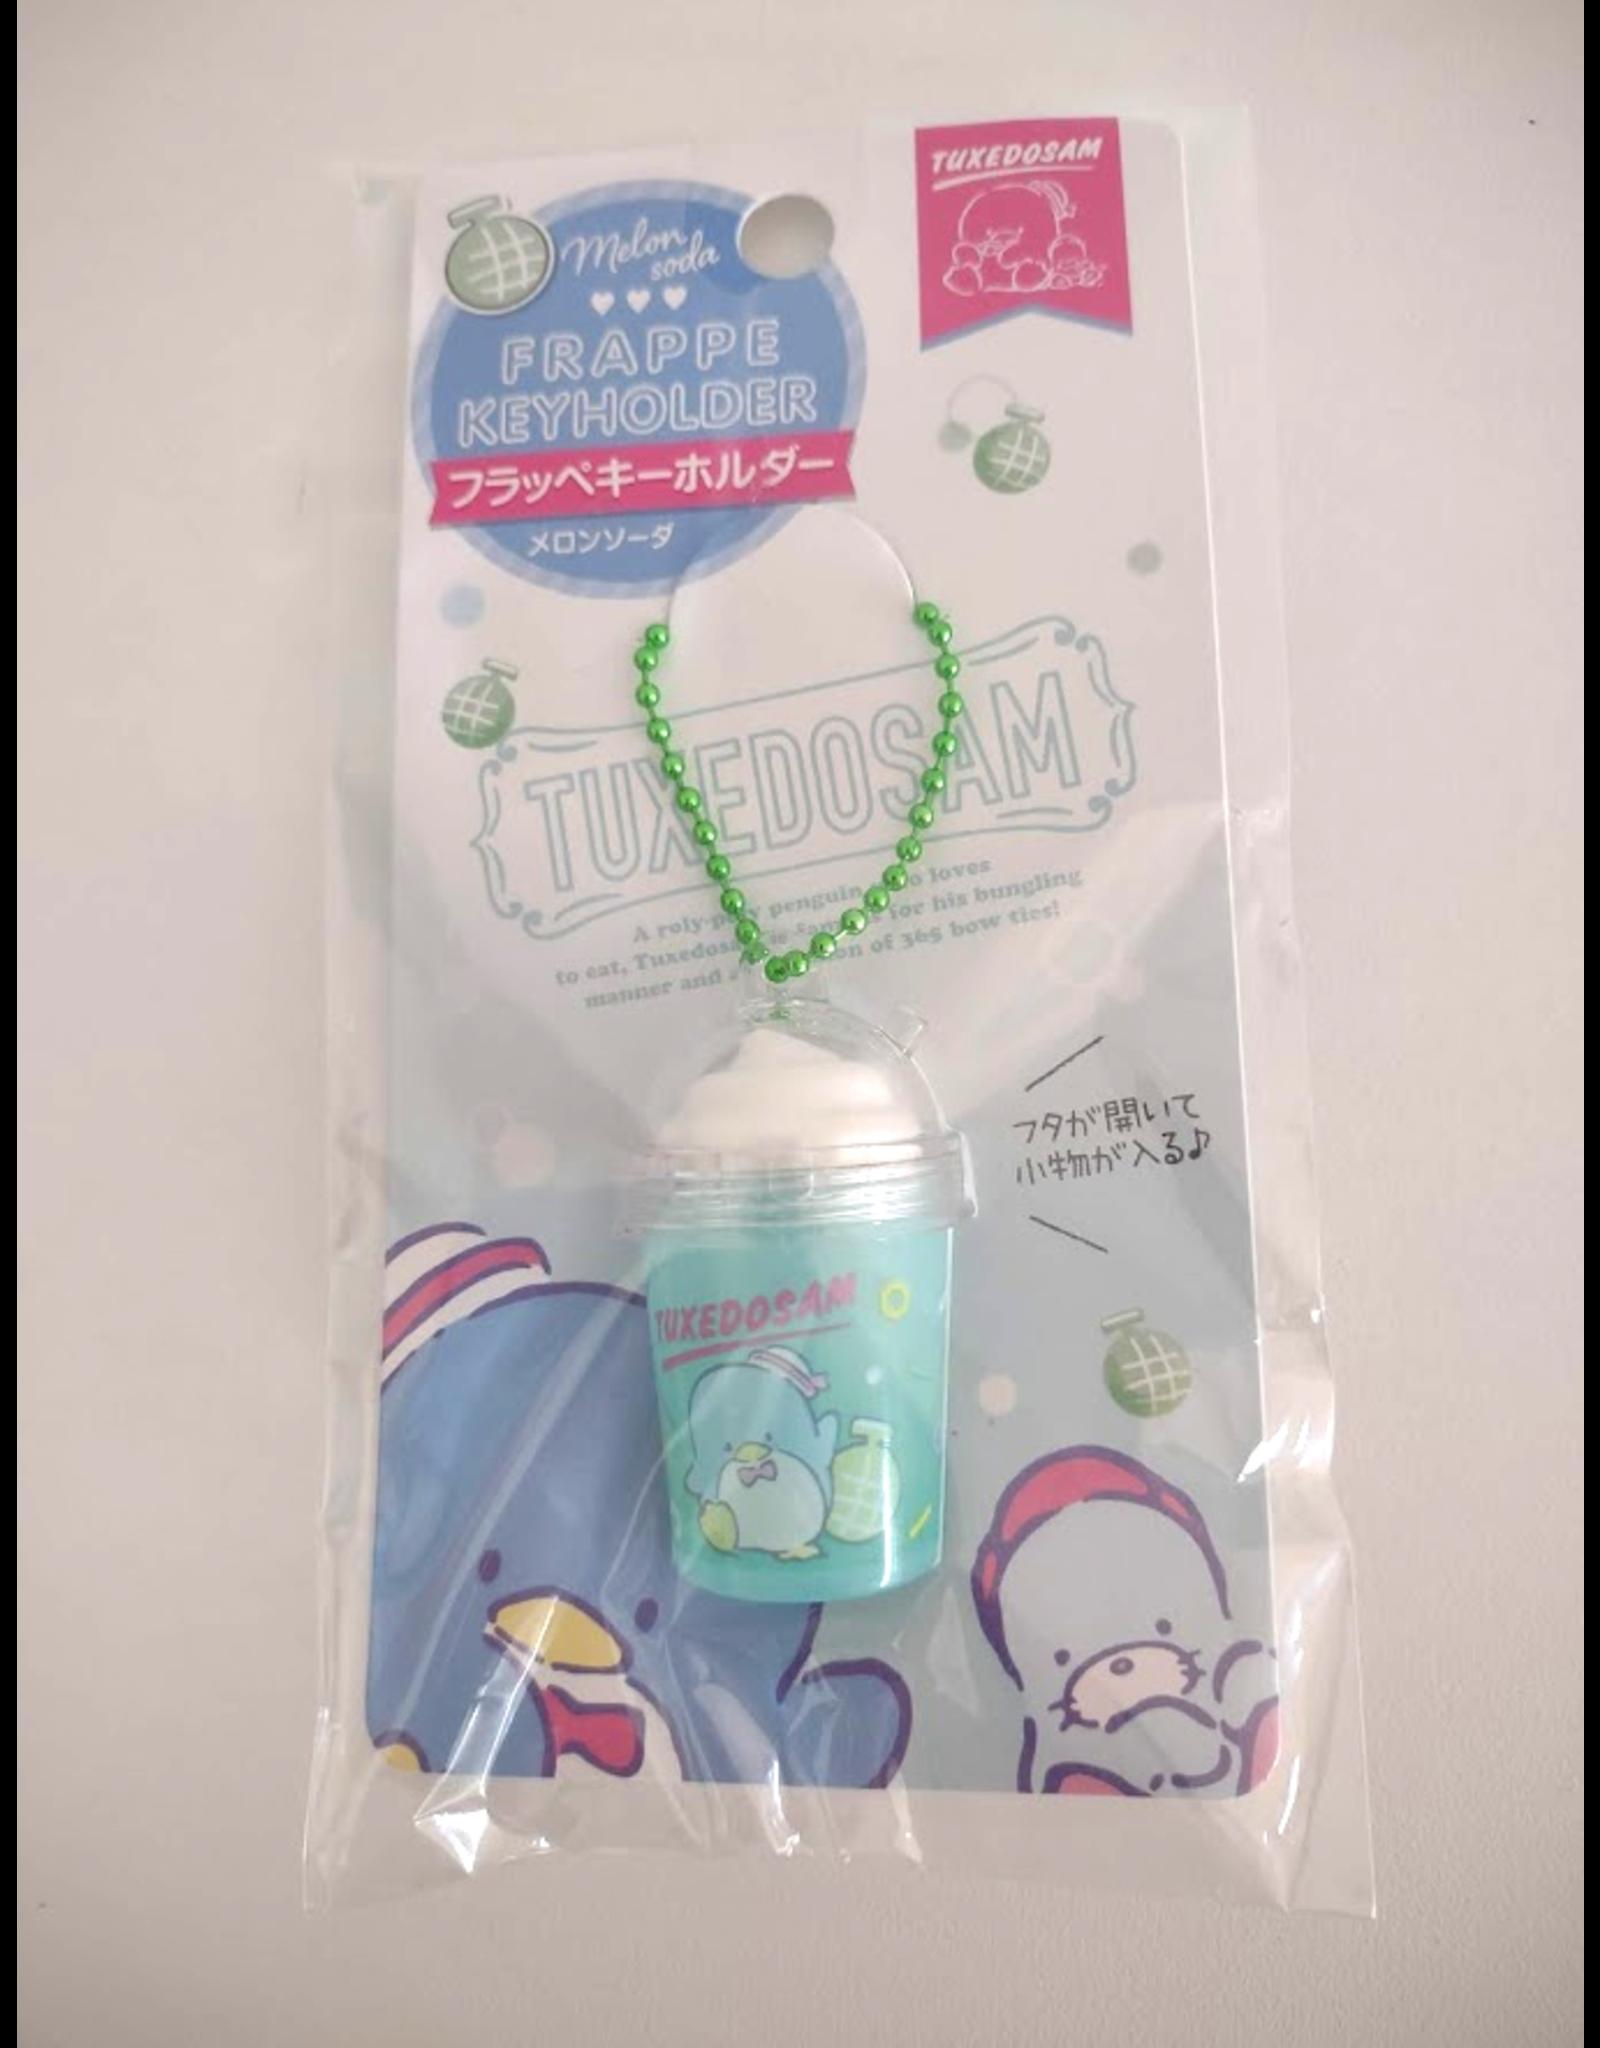 Sanrio Frappe Keyholder - Tuxedo Sam Melon Soda